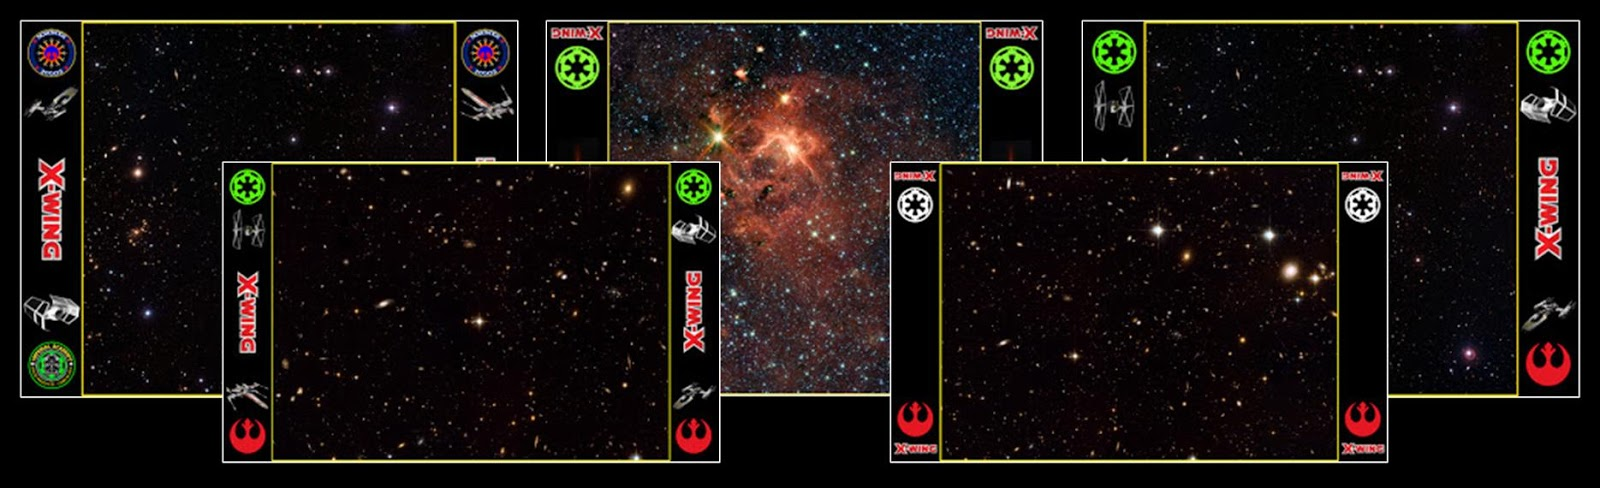 Hobby Before I Die!: Star Wars X-Wing Miniatures Game